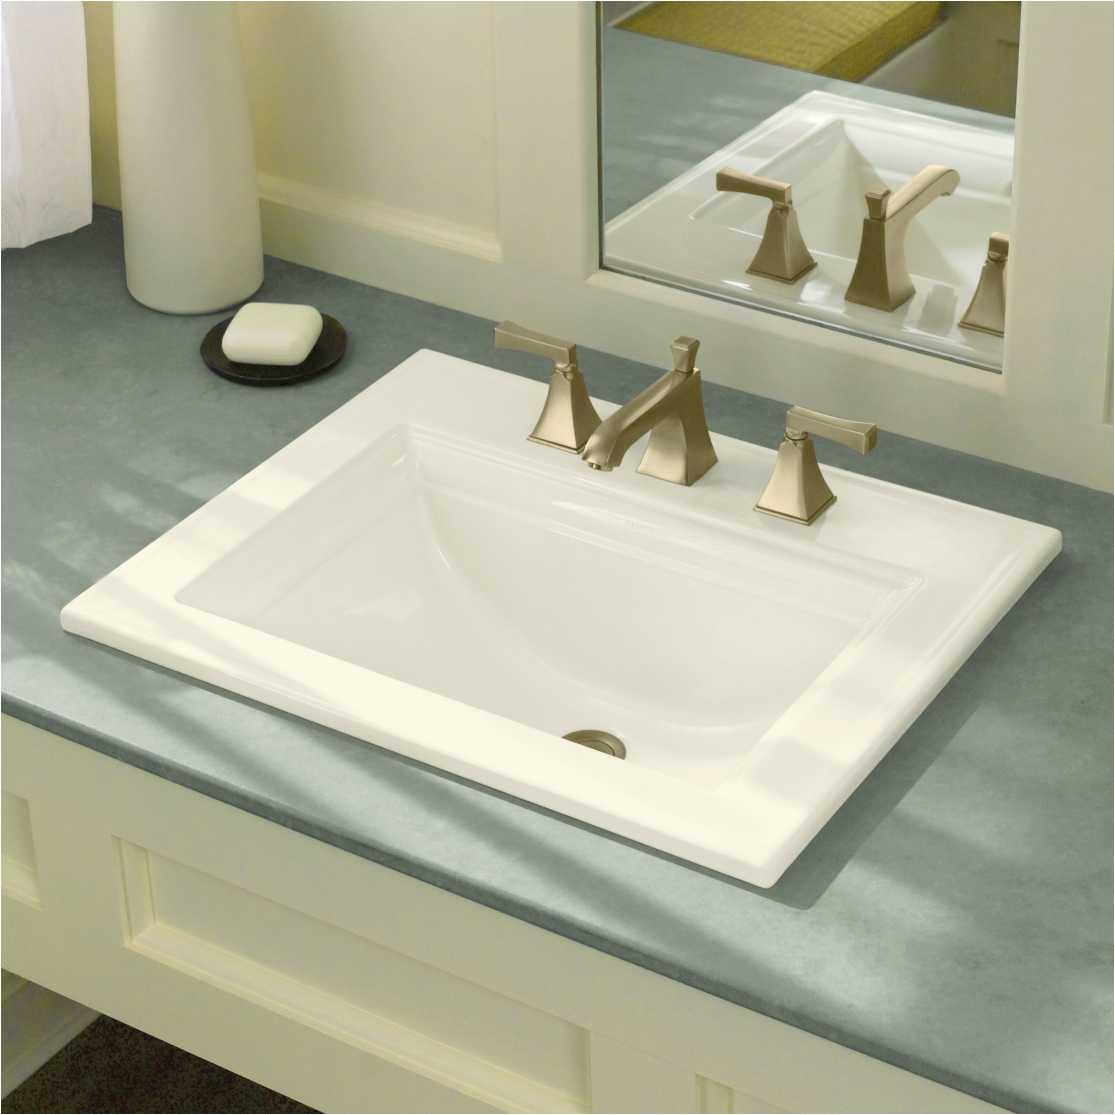 Bathtubs Houston where to Find Lowes Bathtub Surround Installation Bathtubs Information